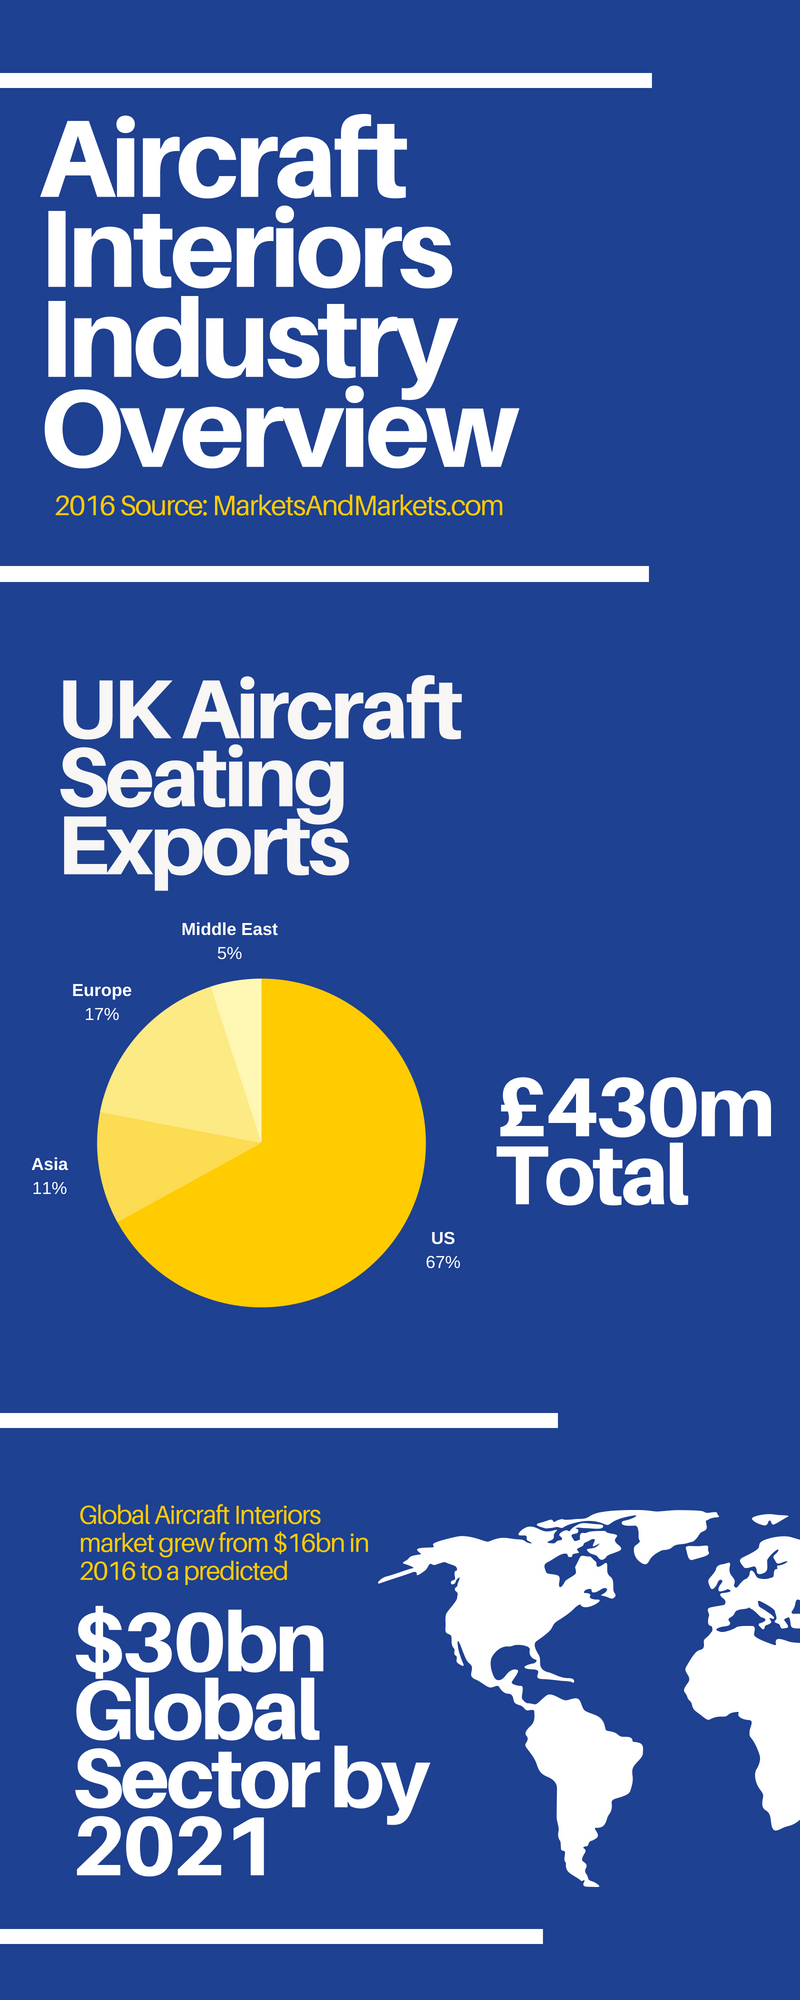 hight resolution of 2016 source marketsandmarkets com uk aircraft seating exports